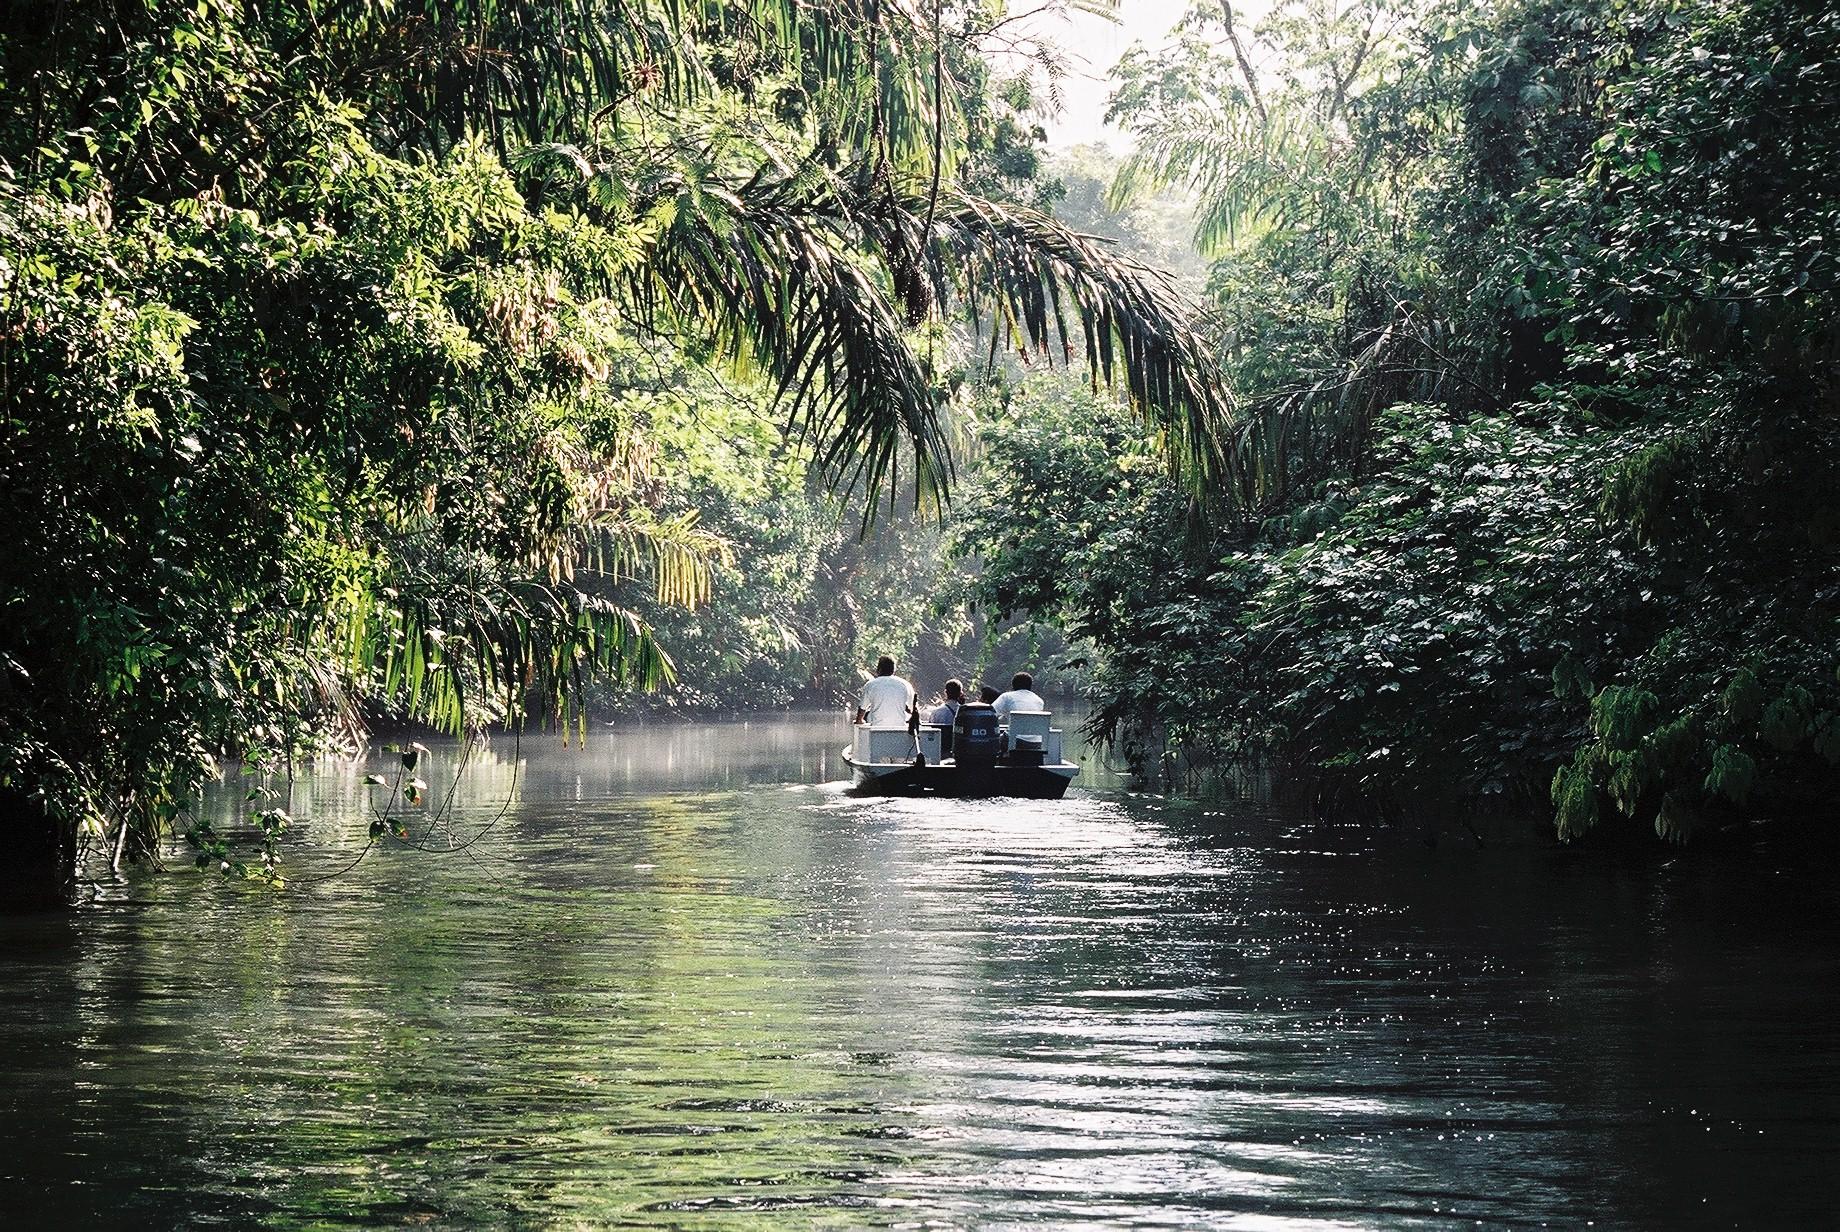 Boat trip into the canales de Parque Nacional Tortuguero, Limón, Costa Rica